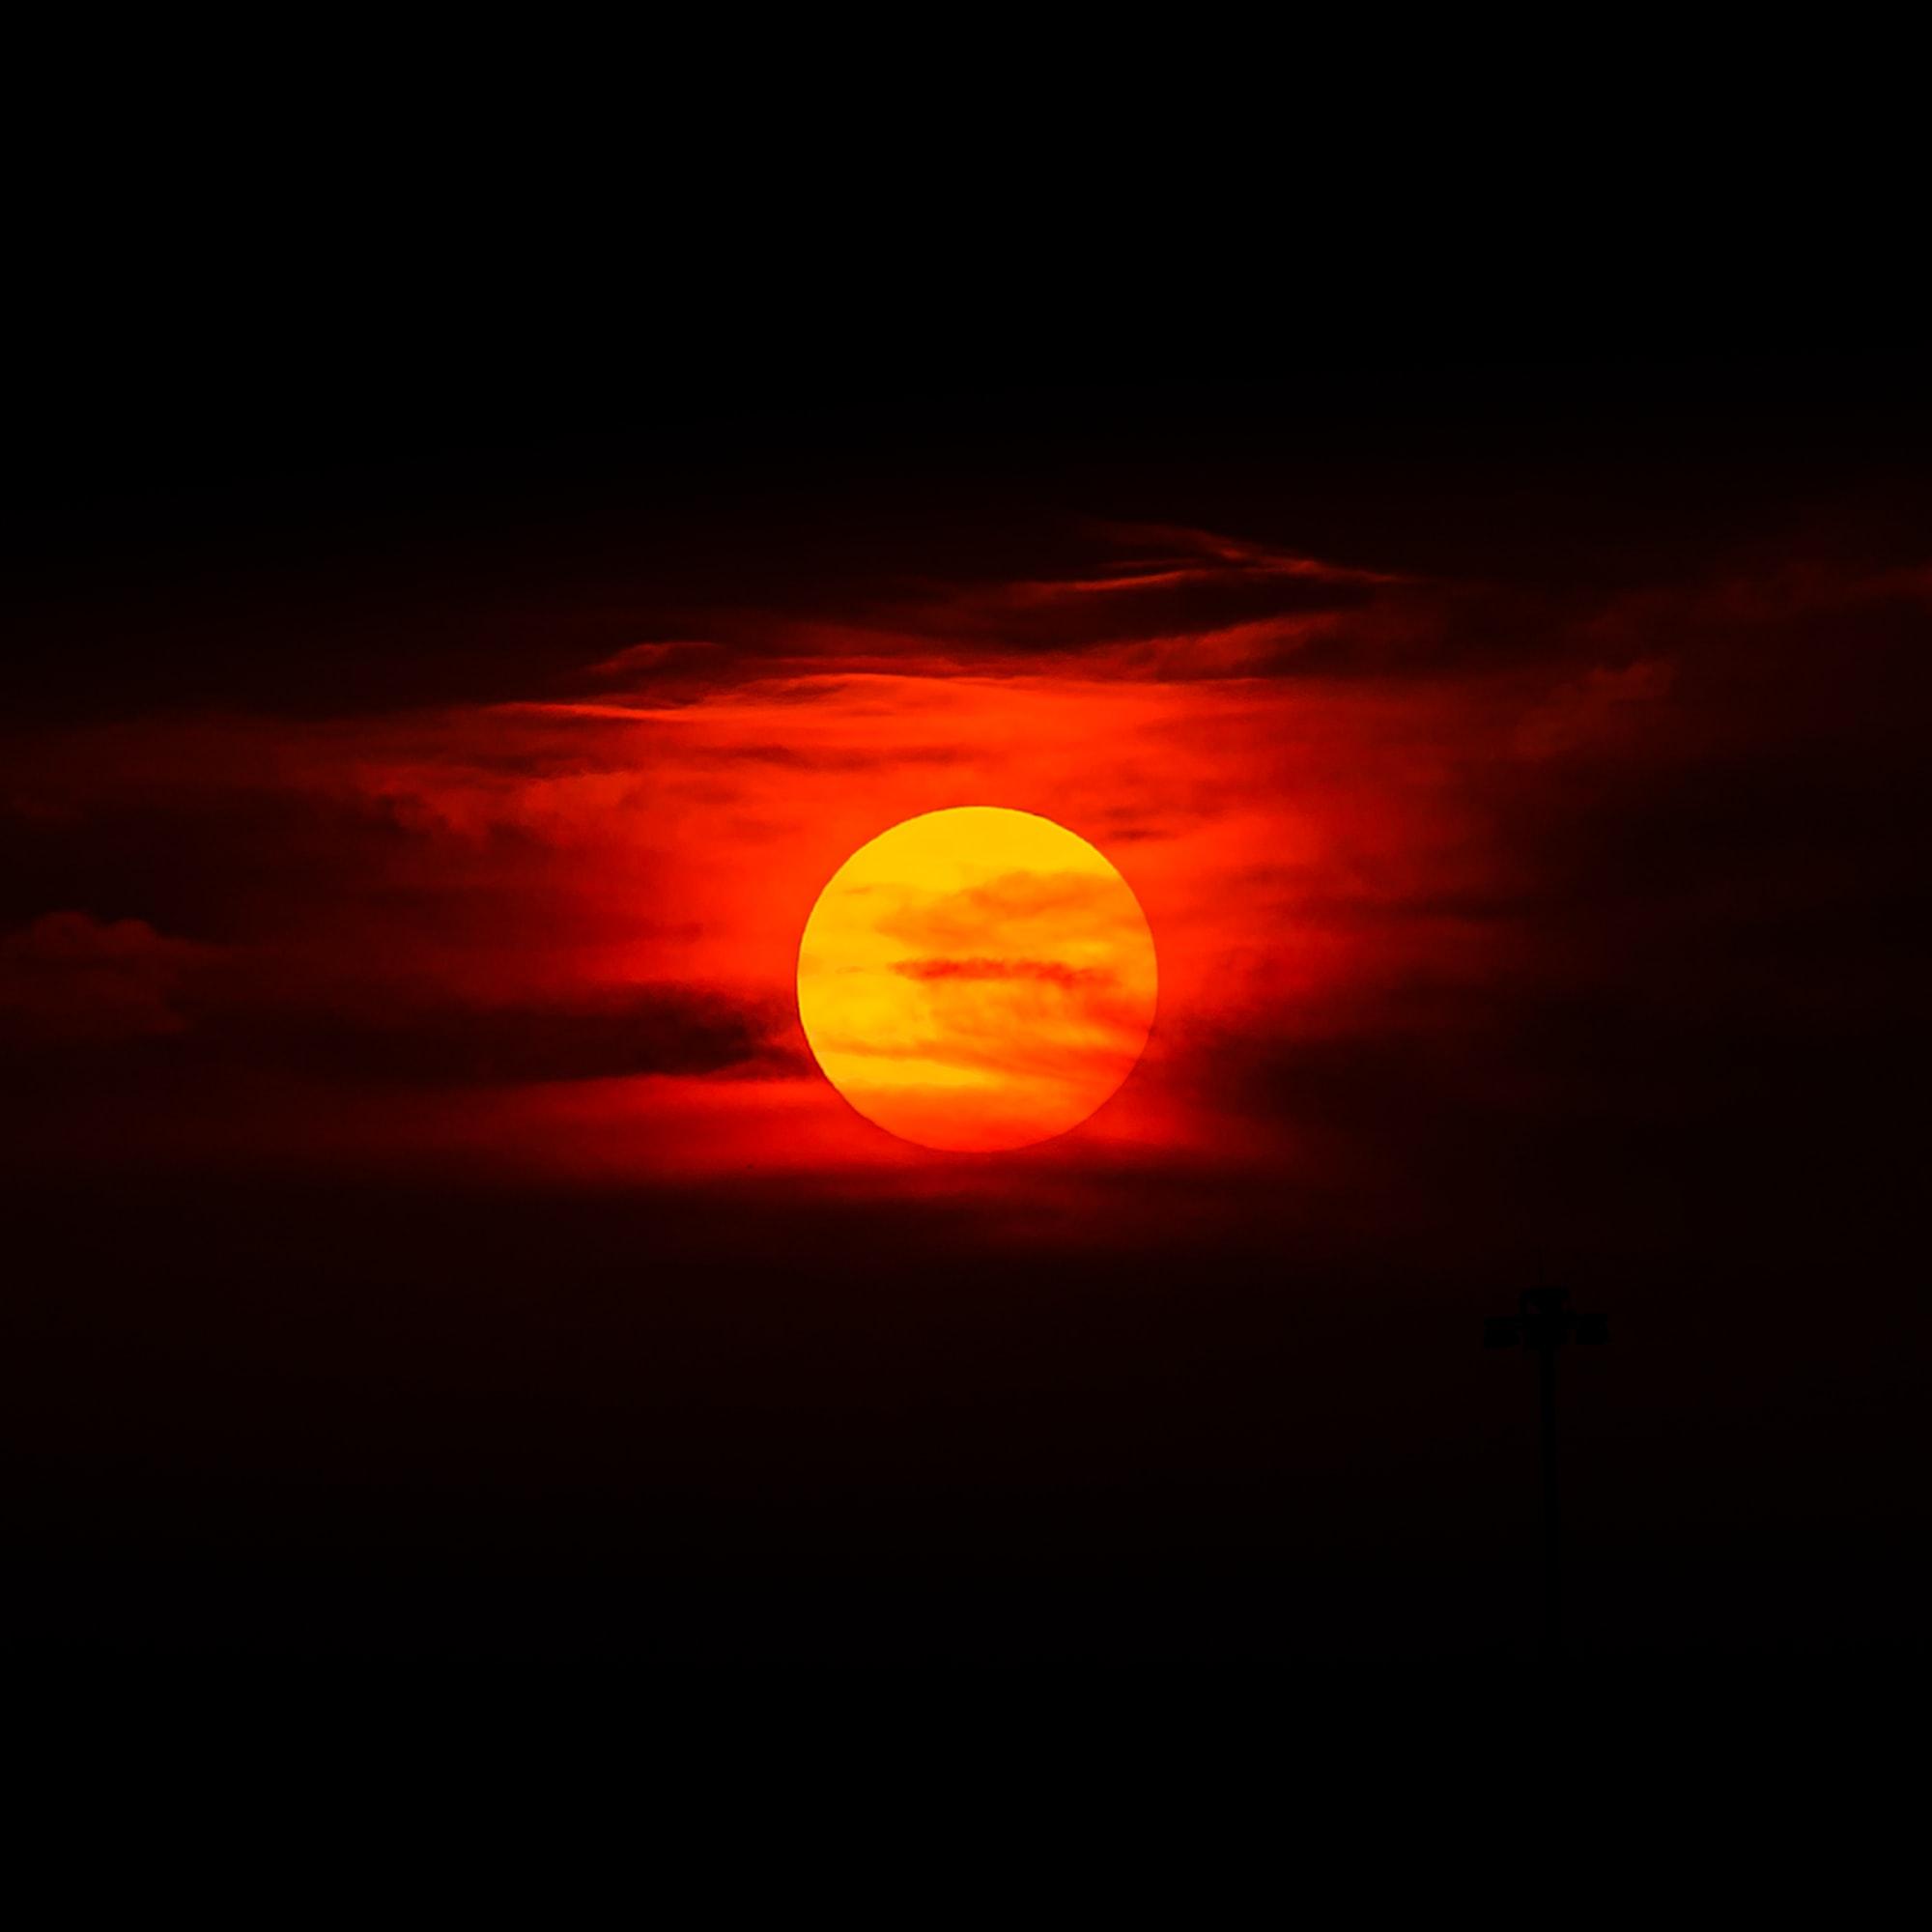 Blood sunset over Arizona.